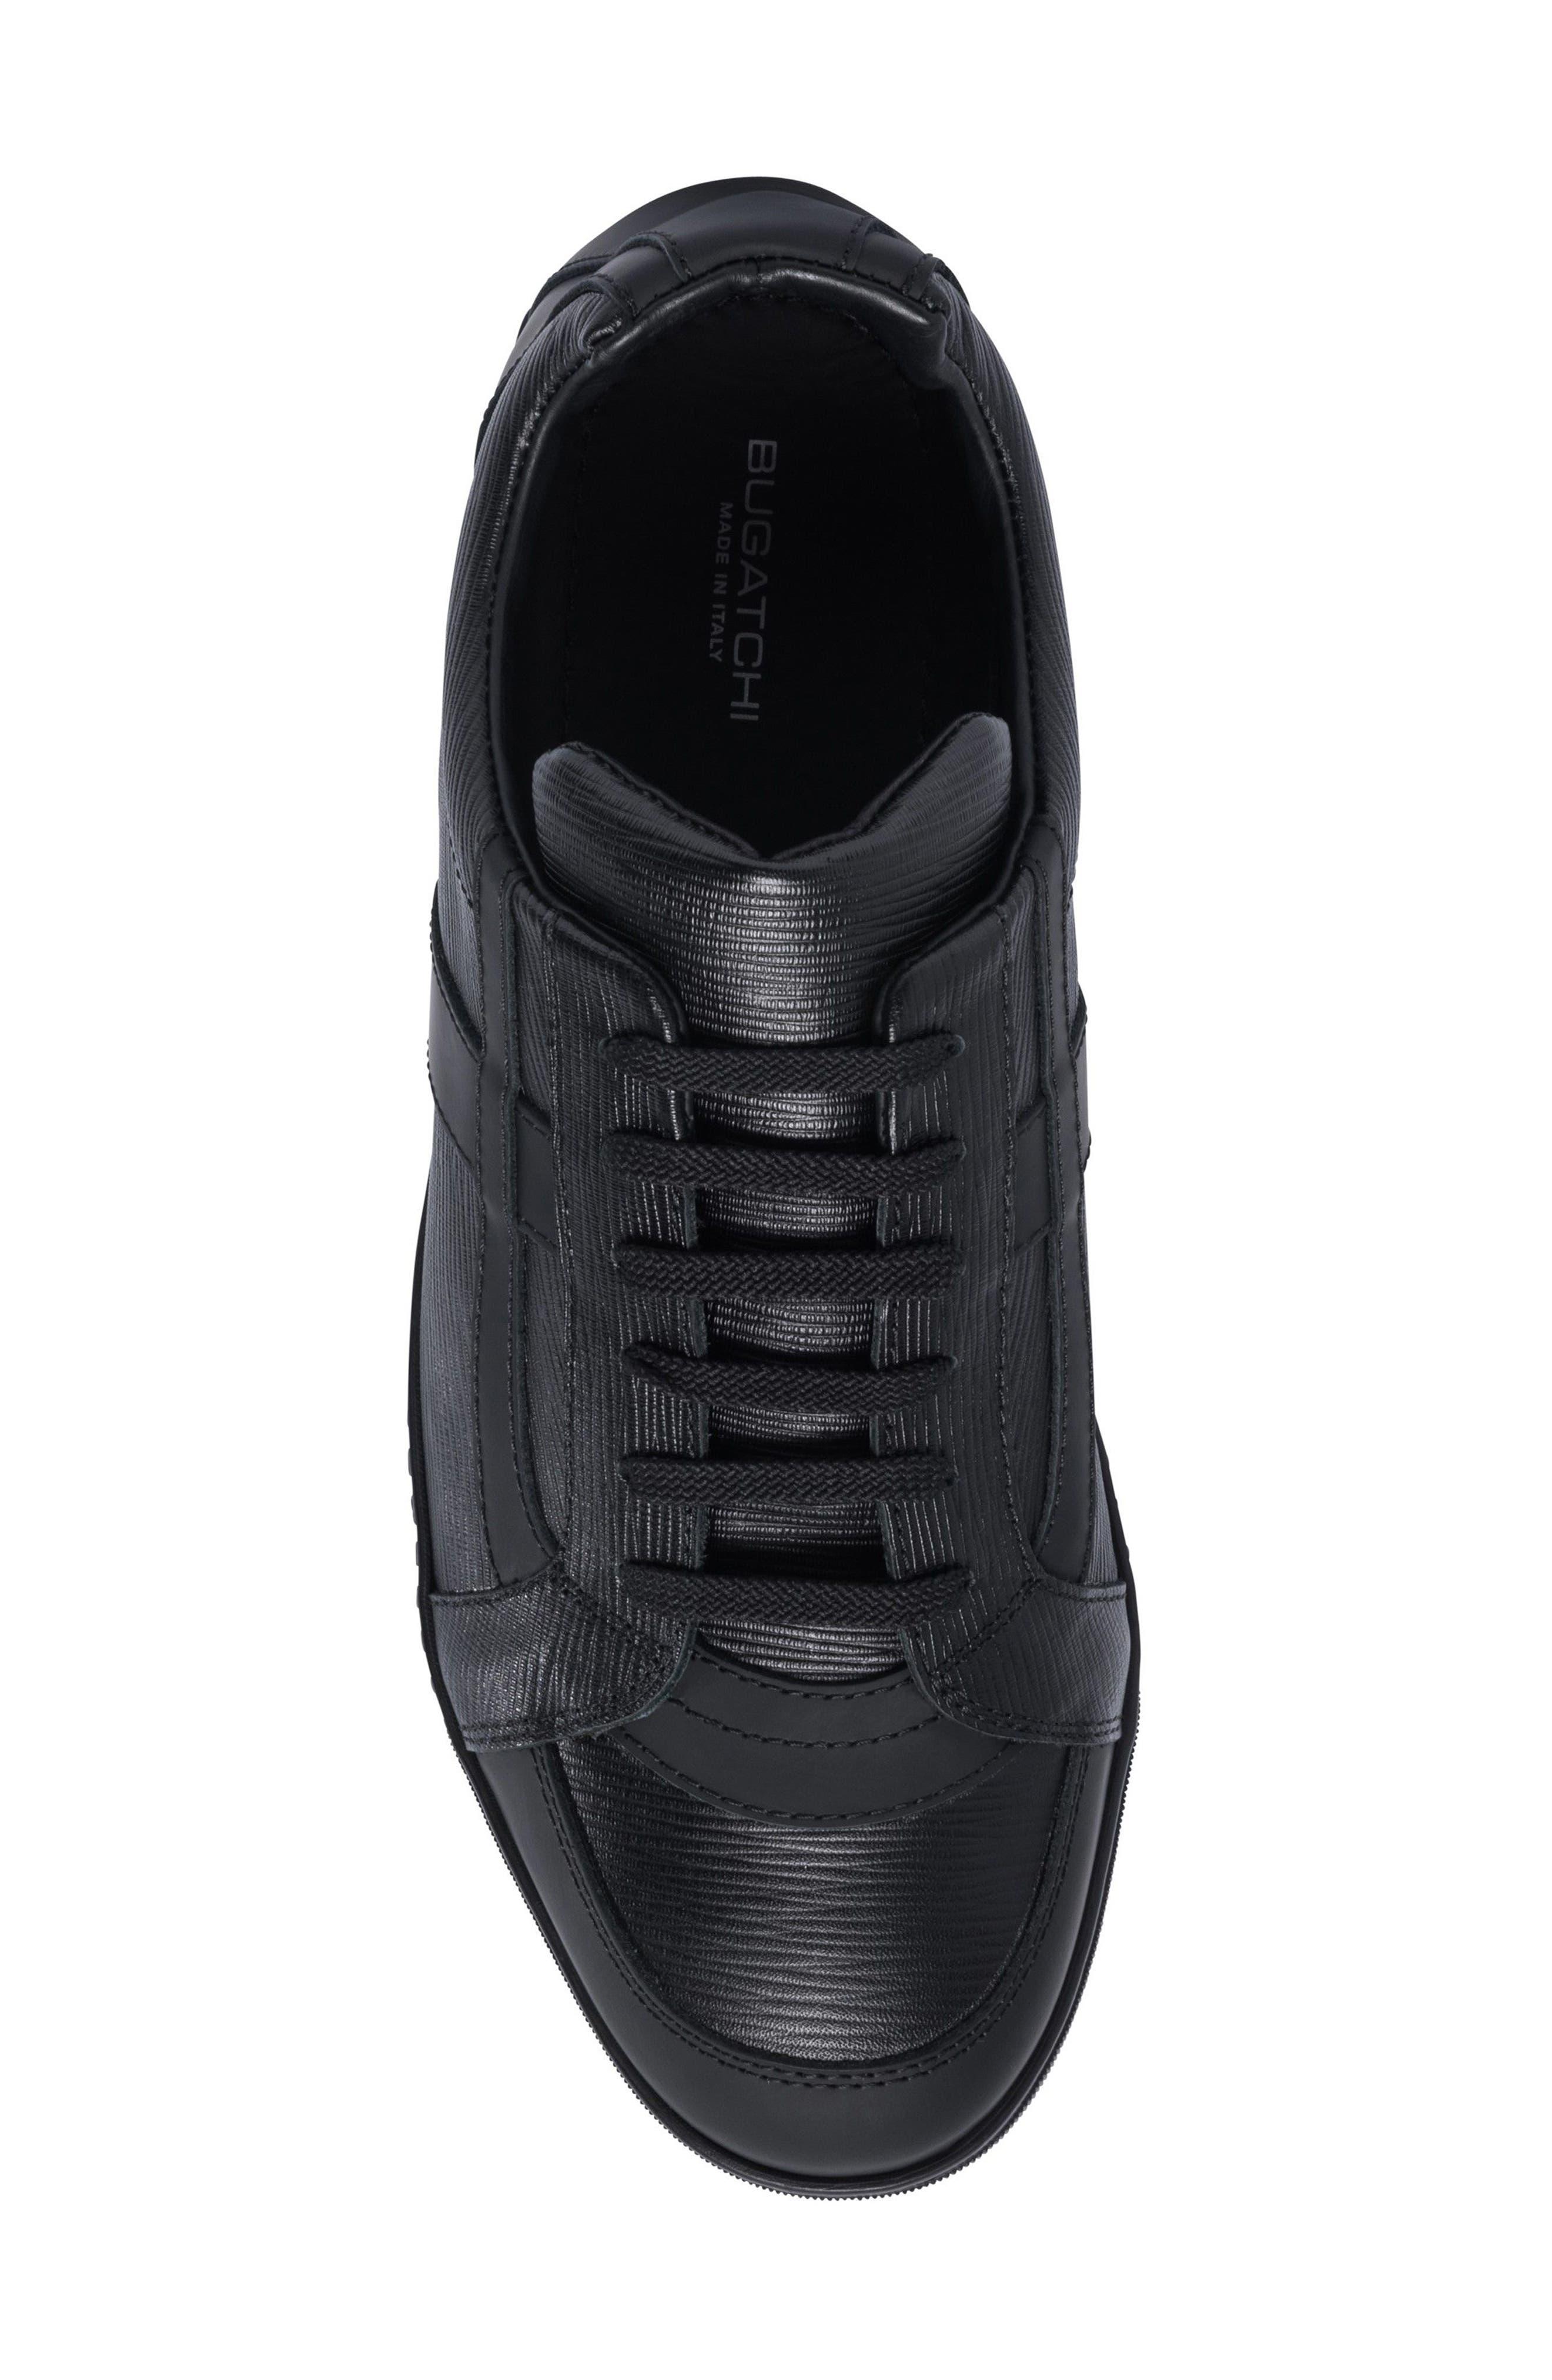 Novecento Sneaker,                             Alternate thumbnail 4, color,                             Navy Leather